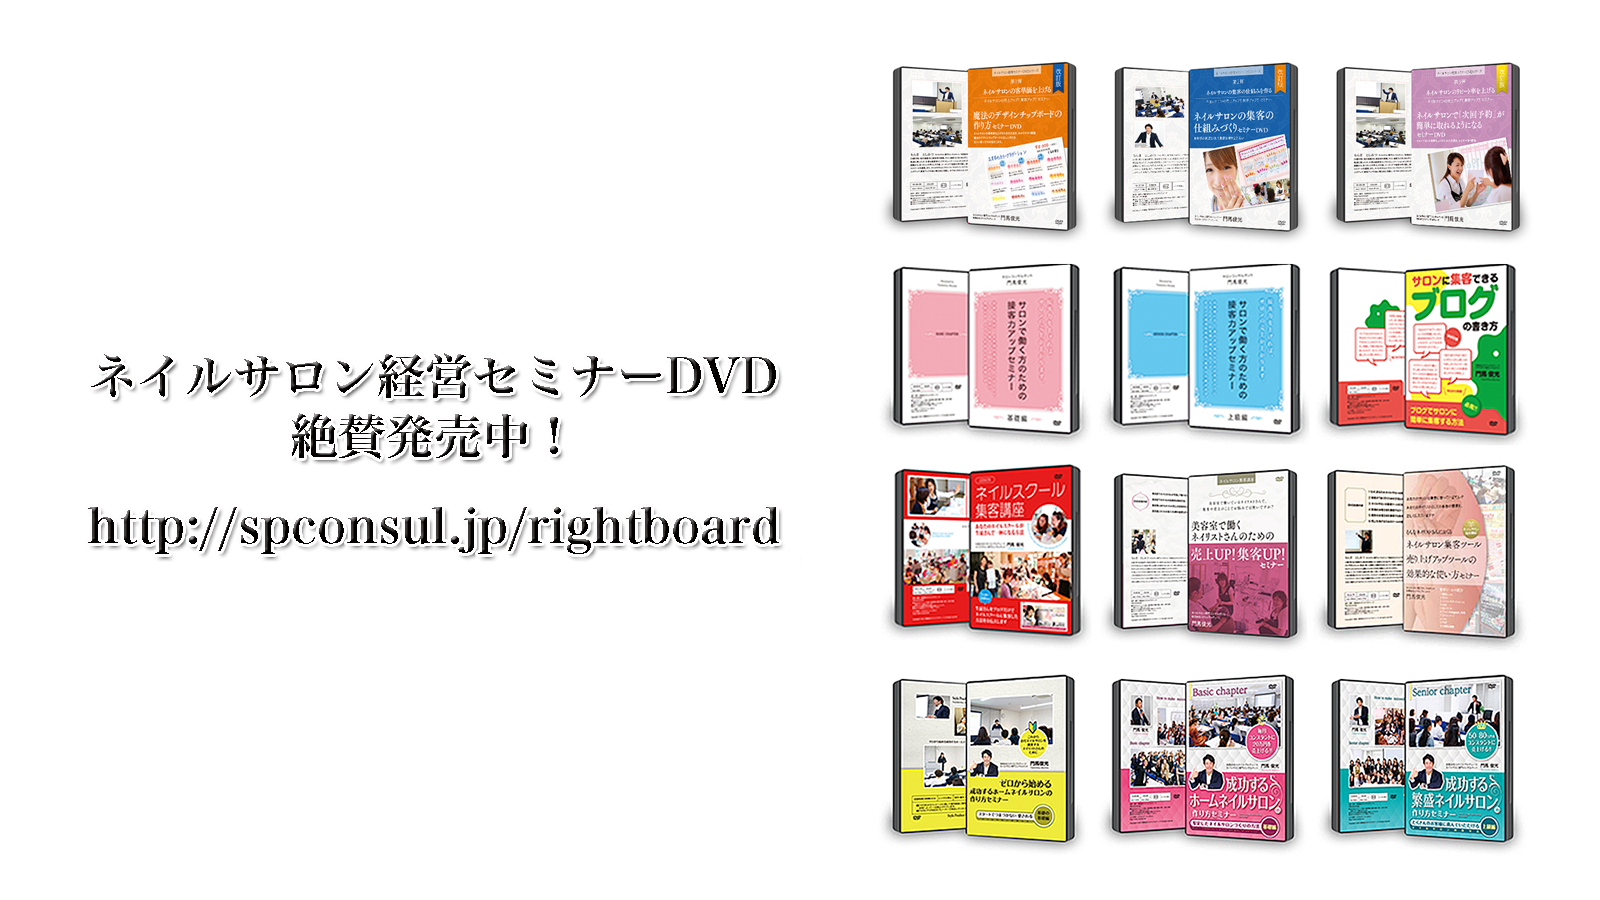 DVDラインナップ